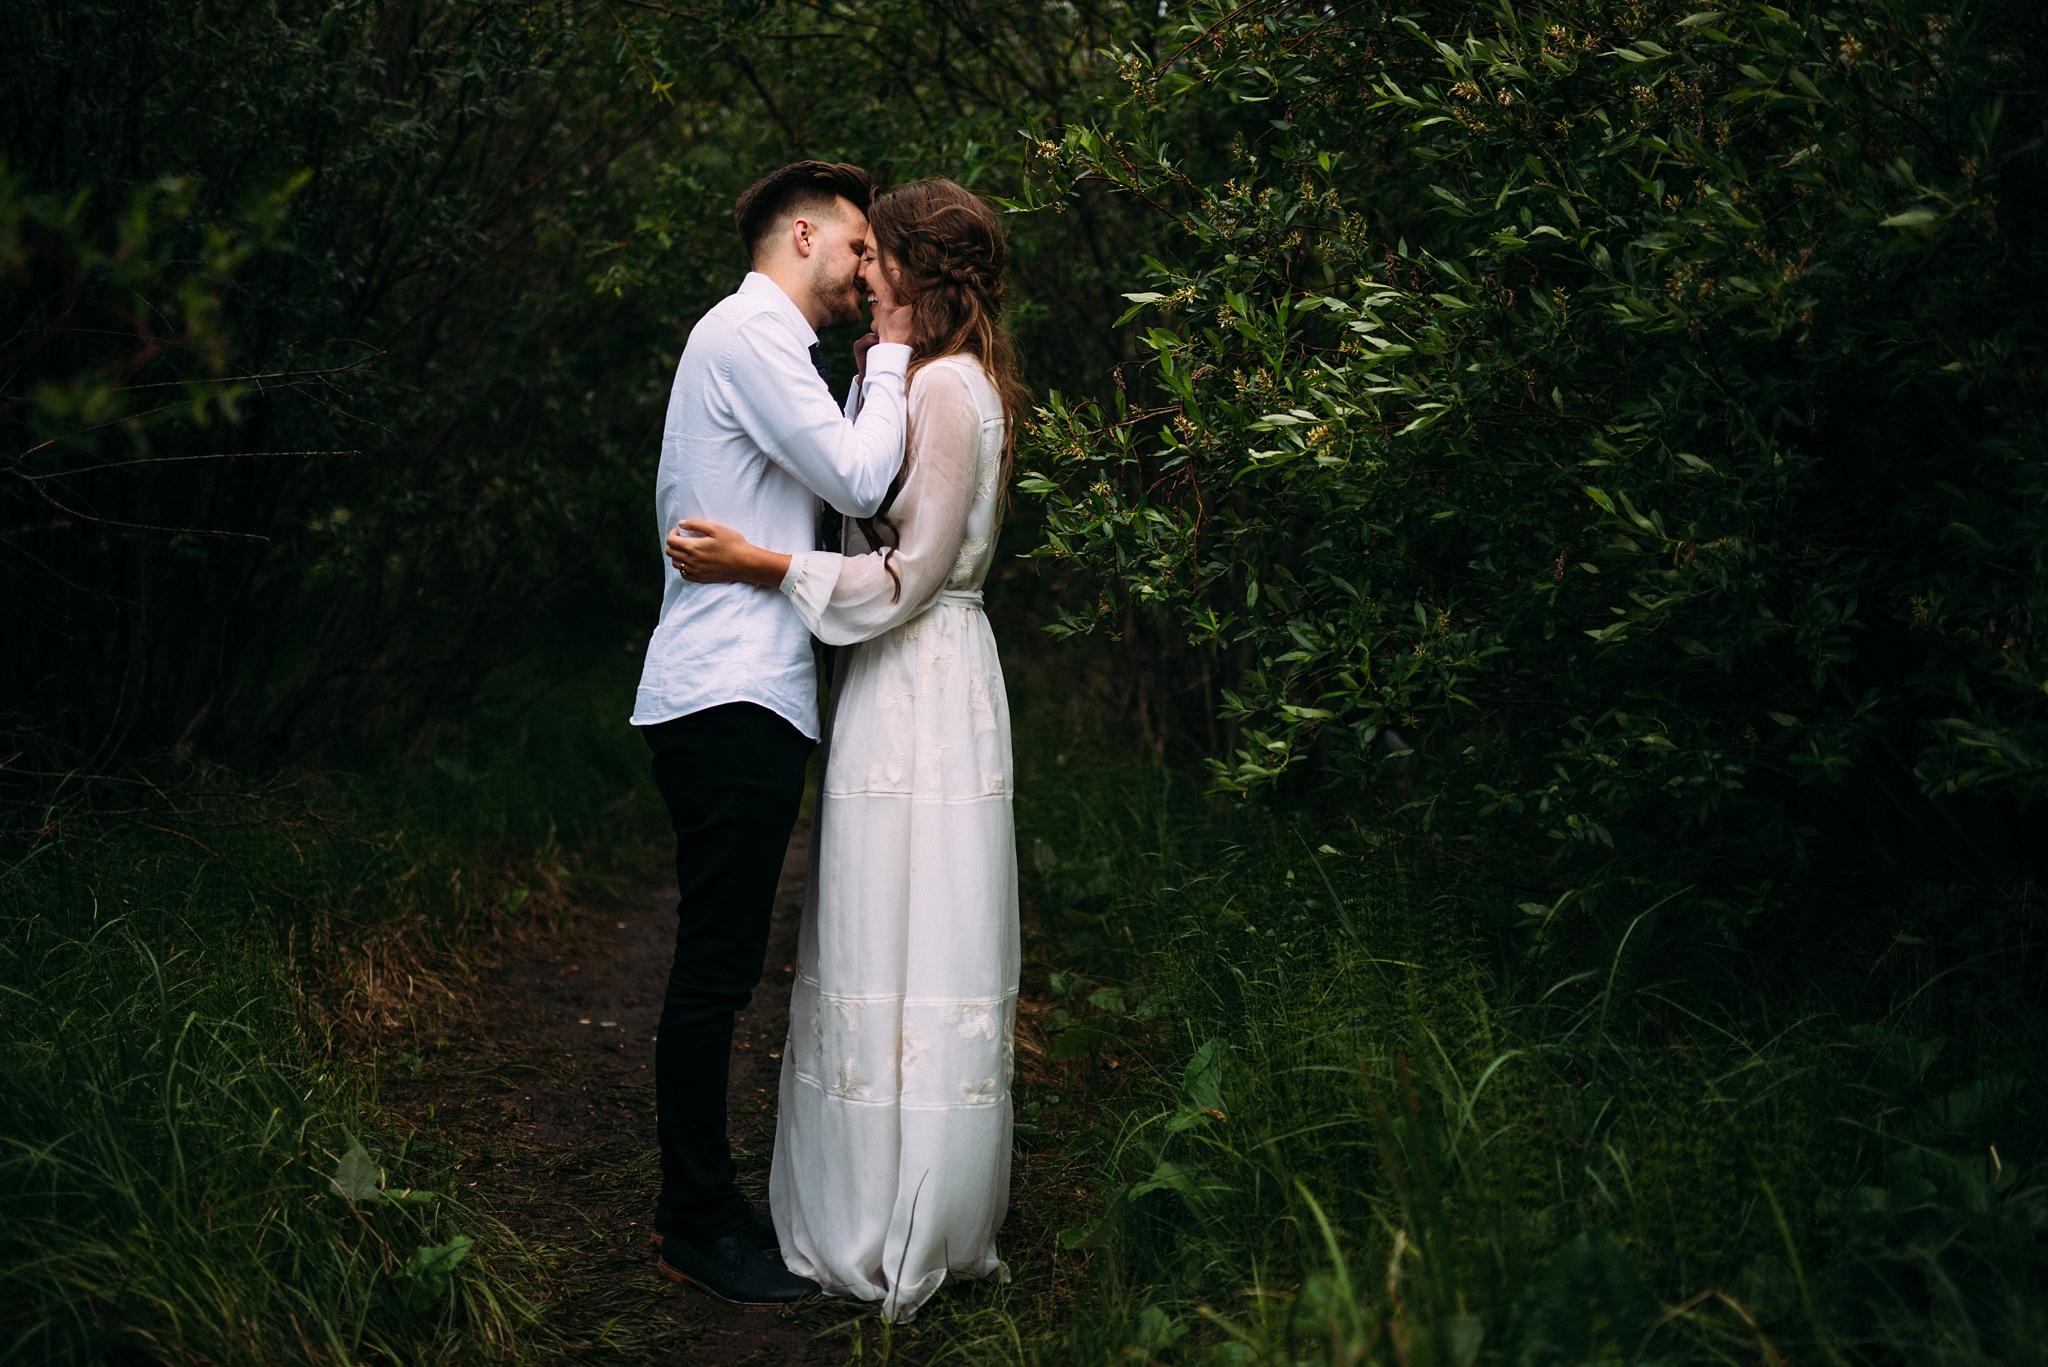 kaihla_tonai_intimate_wedding_elopement_photographer_4134